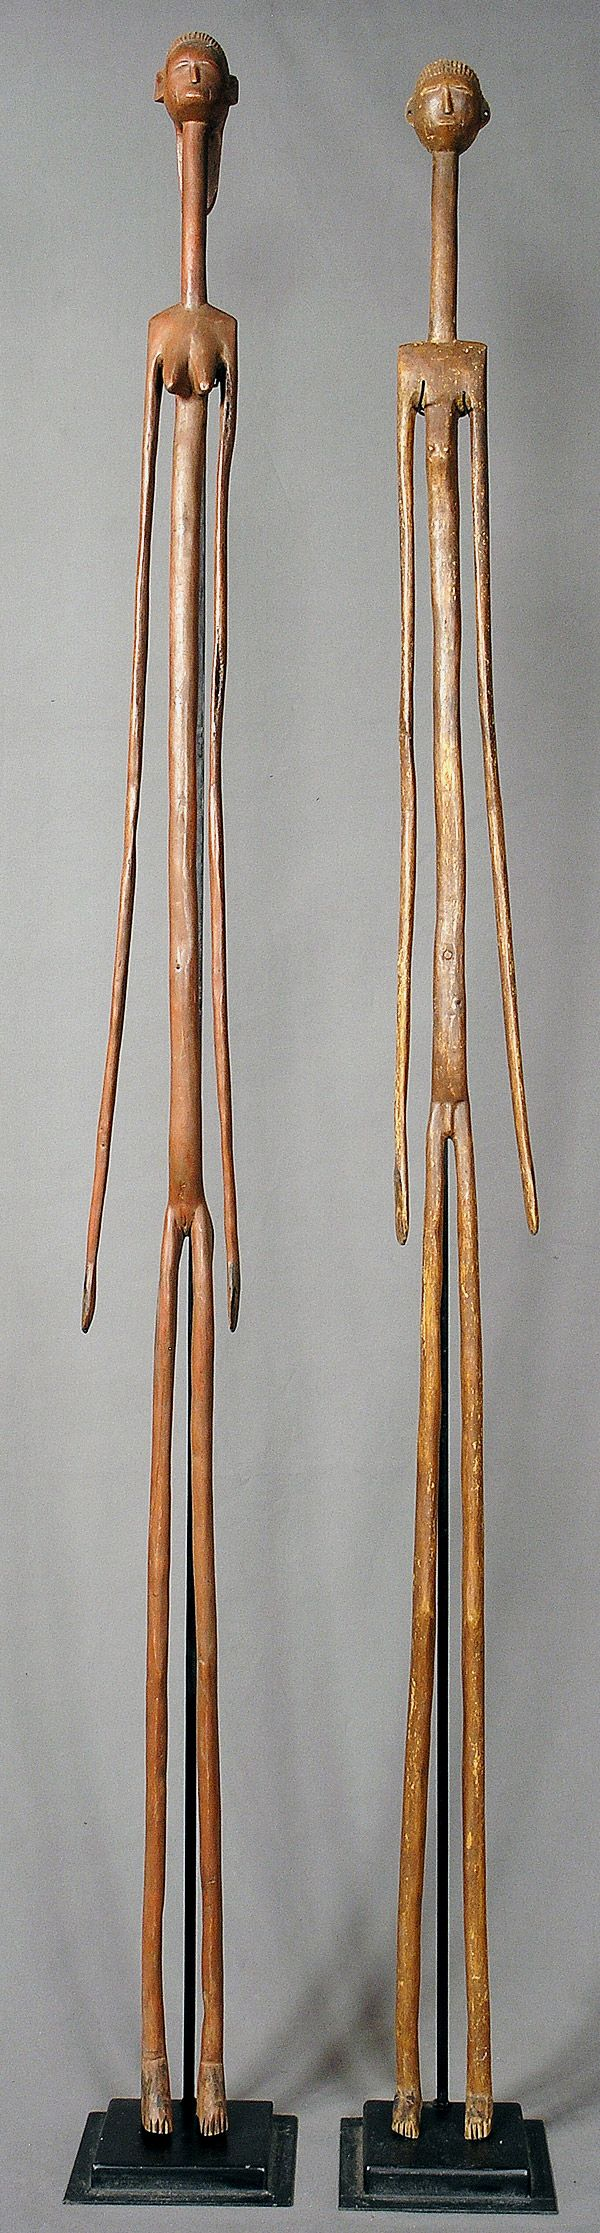 Paire de statues d'ancêtres Nyamwezi - http://www.homesbyjohnburke.com/